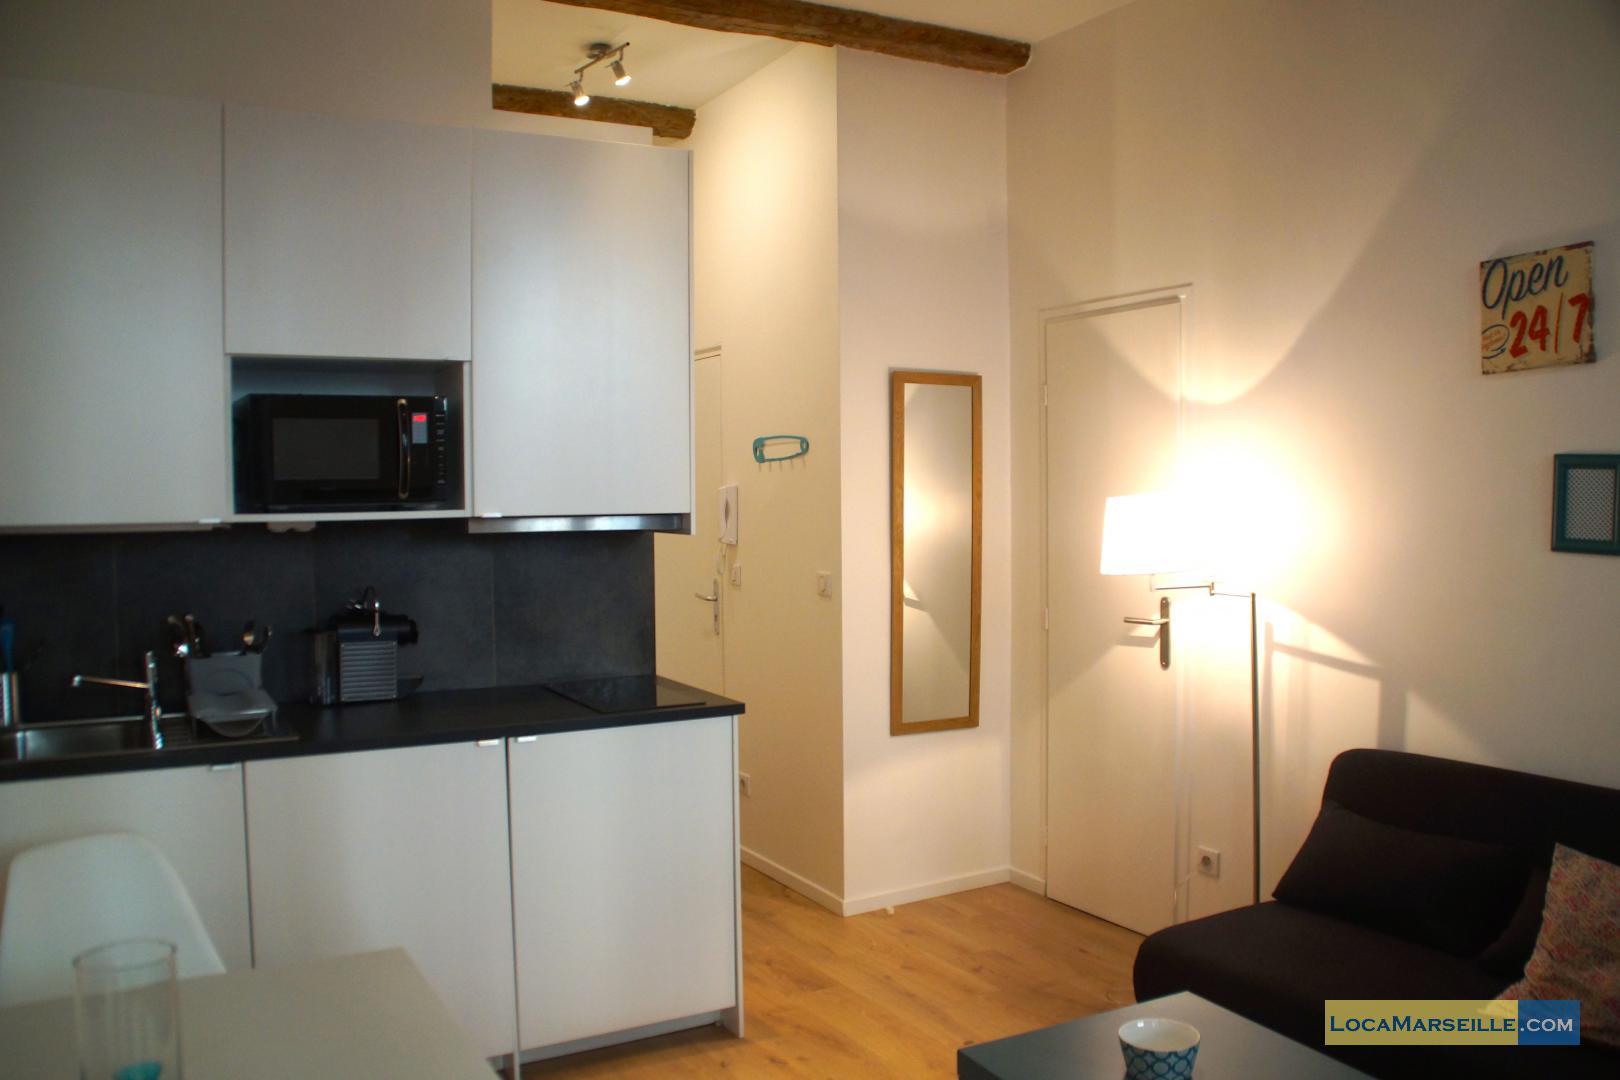 Marseille location meubl e appartement type t2 cesar for Location appartement design marseille